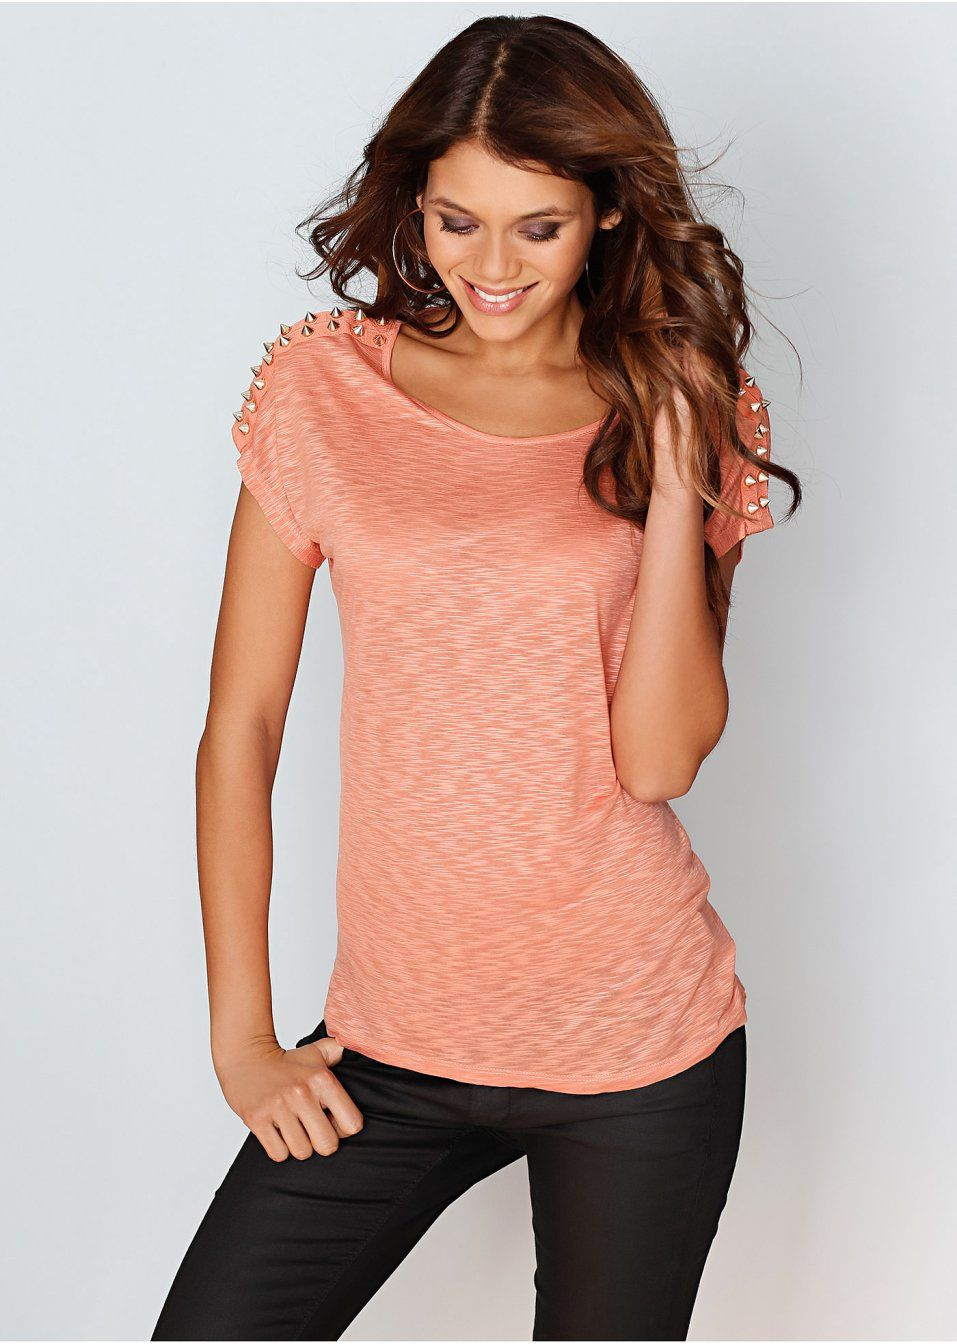 #shirt with #rivets #bonprix